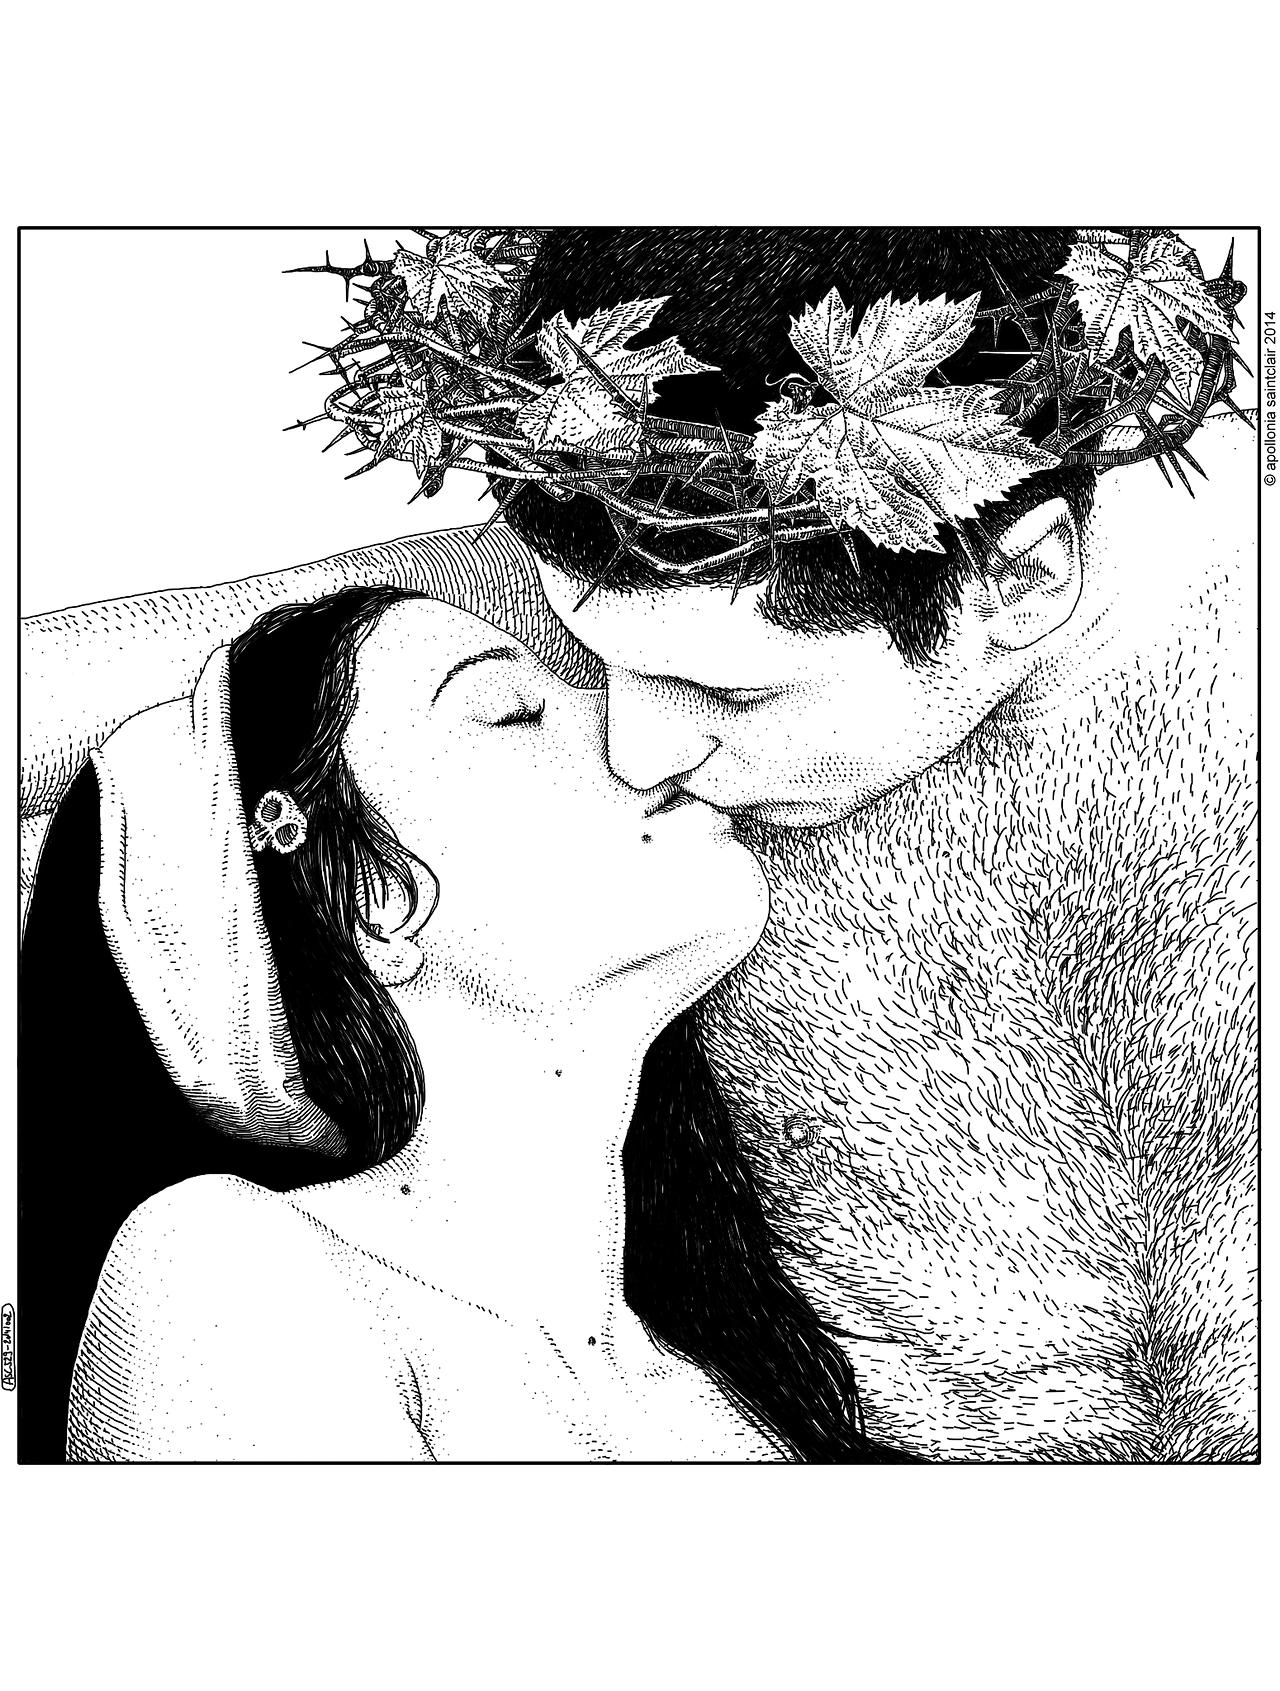 EBDLN-Apollonia-Saintclair-Erotica-1